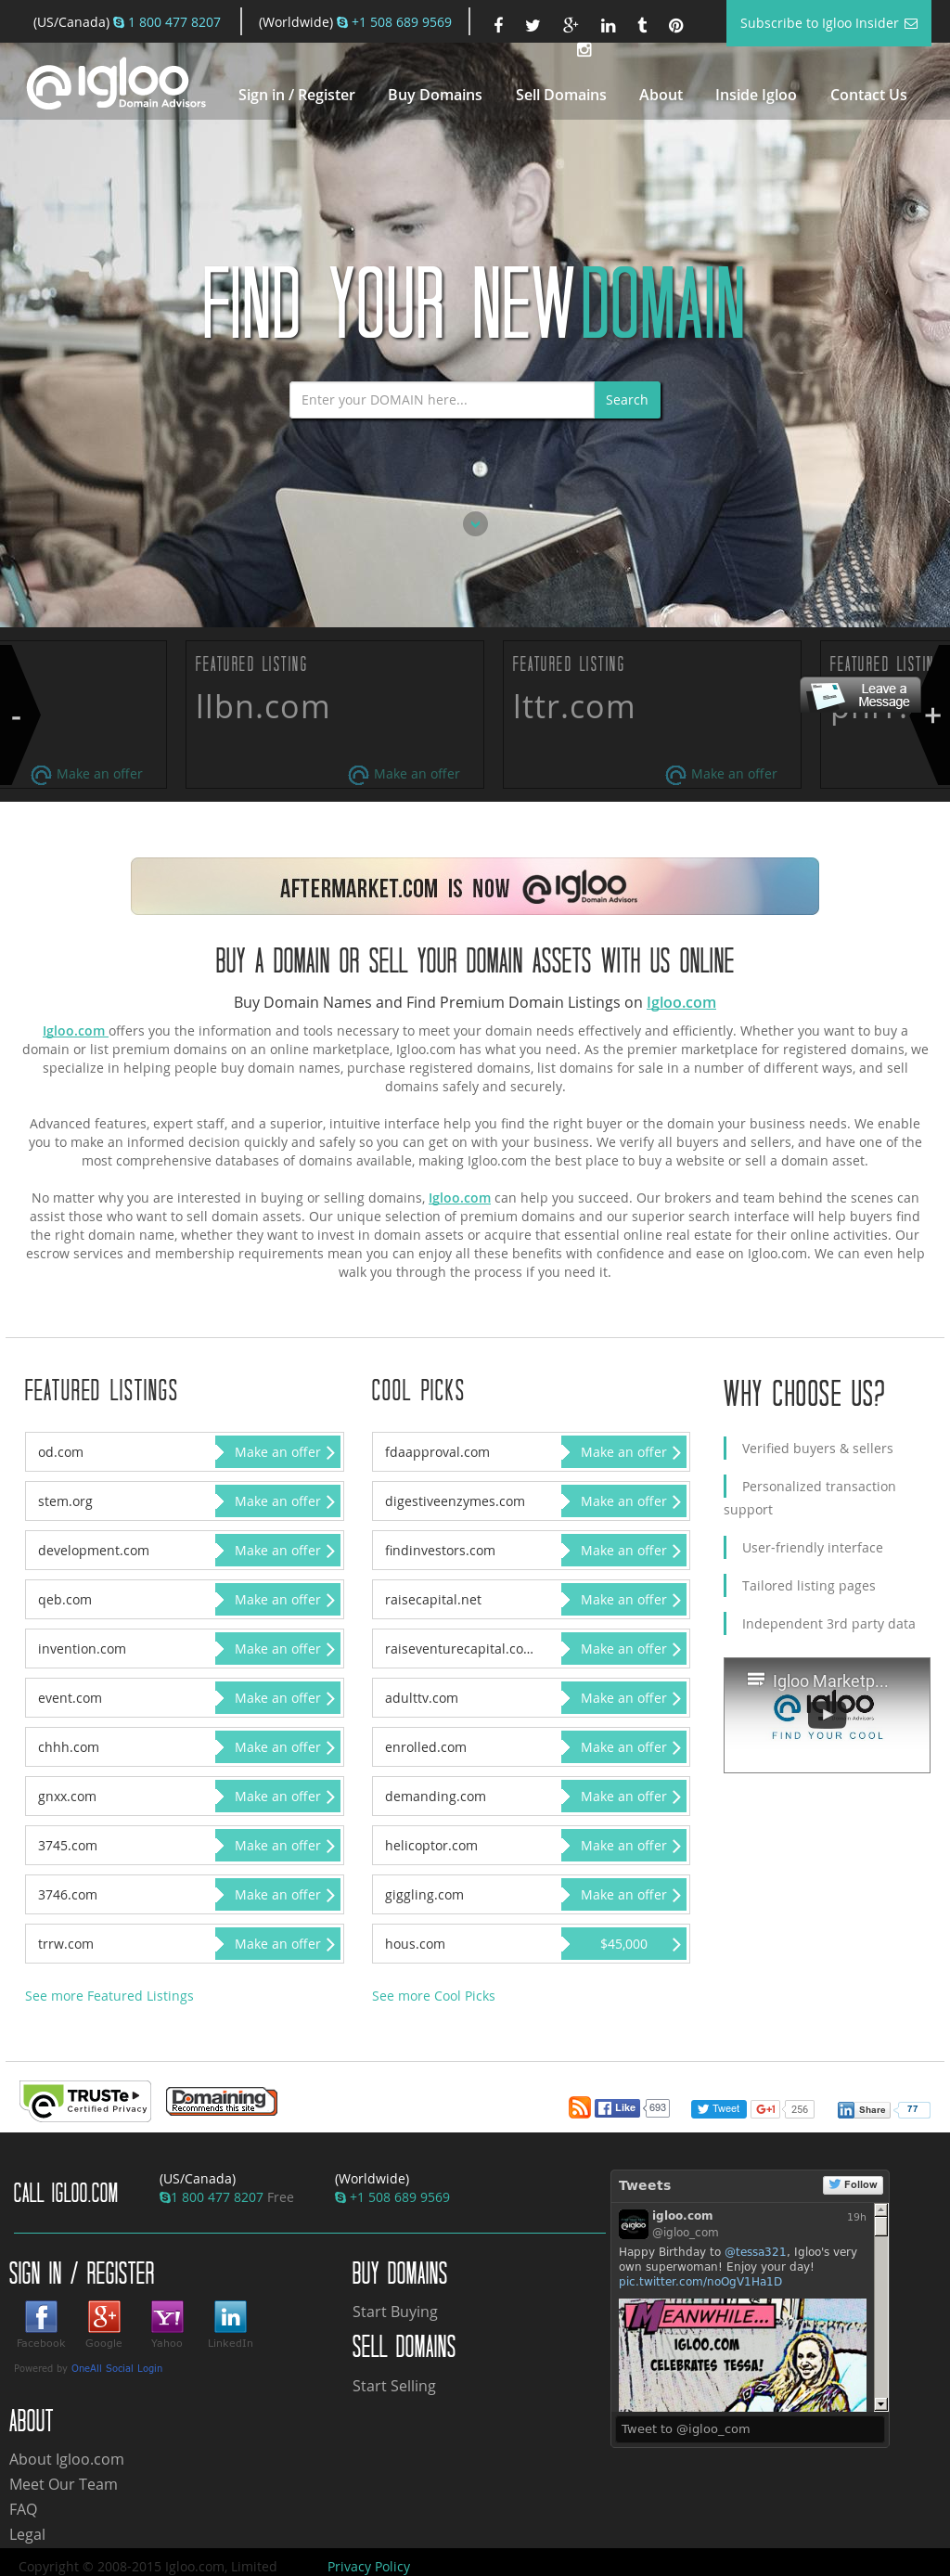 Igloo com Competitors, Revenue and Employees - Owler Company